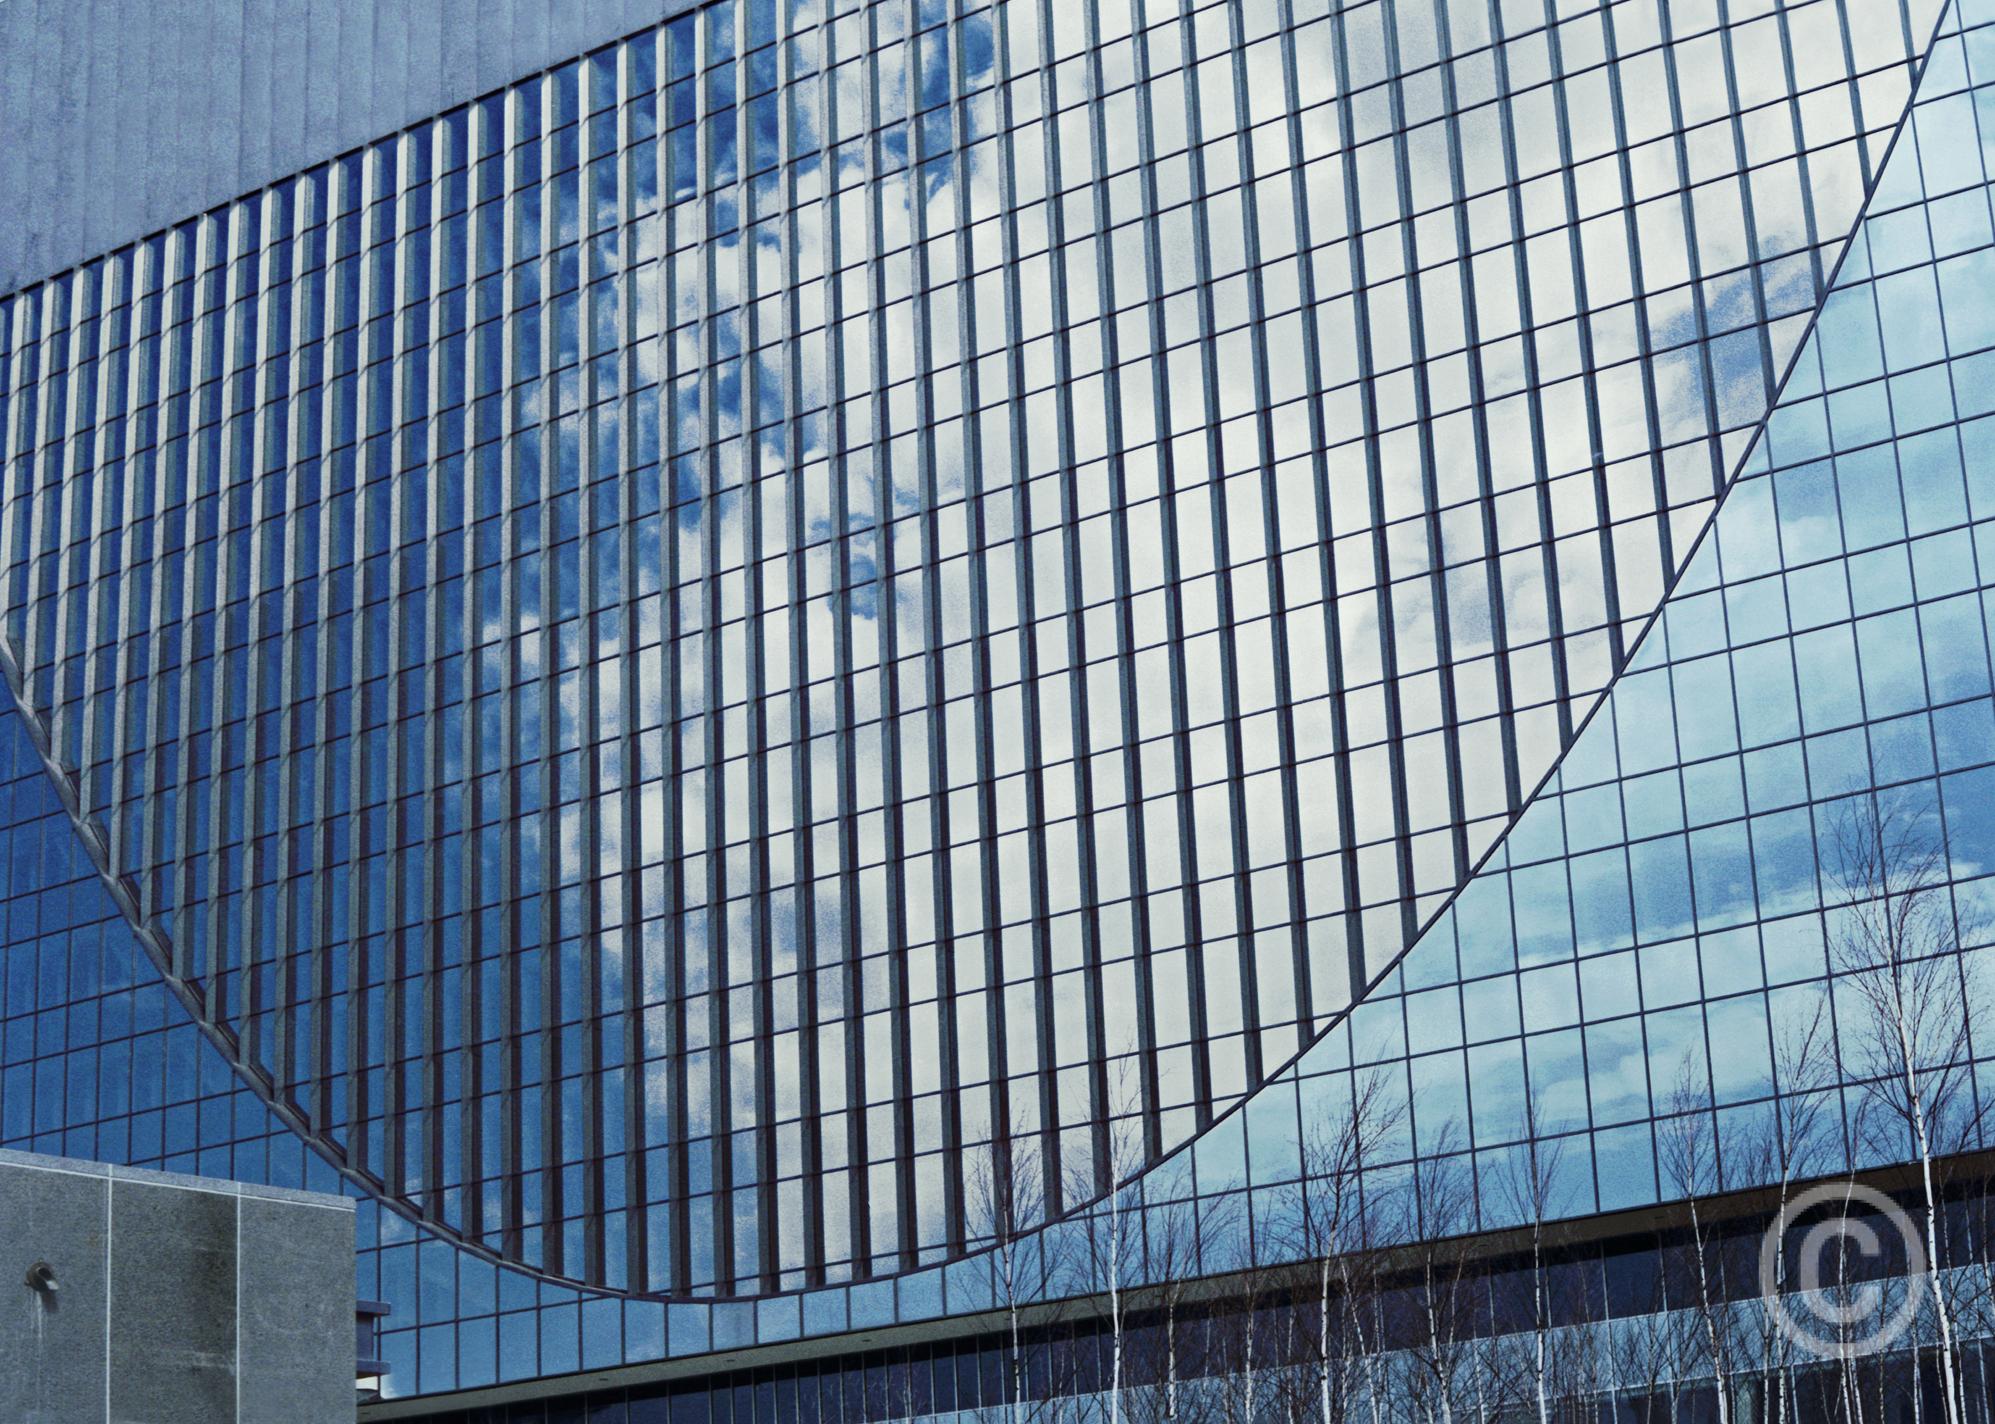 Federal Reserve Bank of Minneapolis, Minneapolis, Minnesota 1967–1973 (now: Marquette Plaza), Architect: Gunnar Birkerts © Prosper Jerominus, 2017